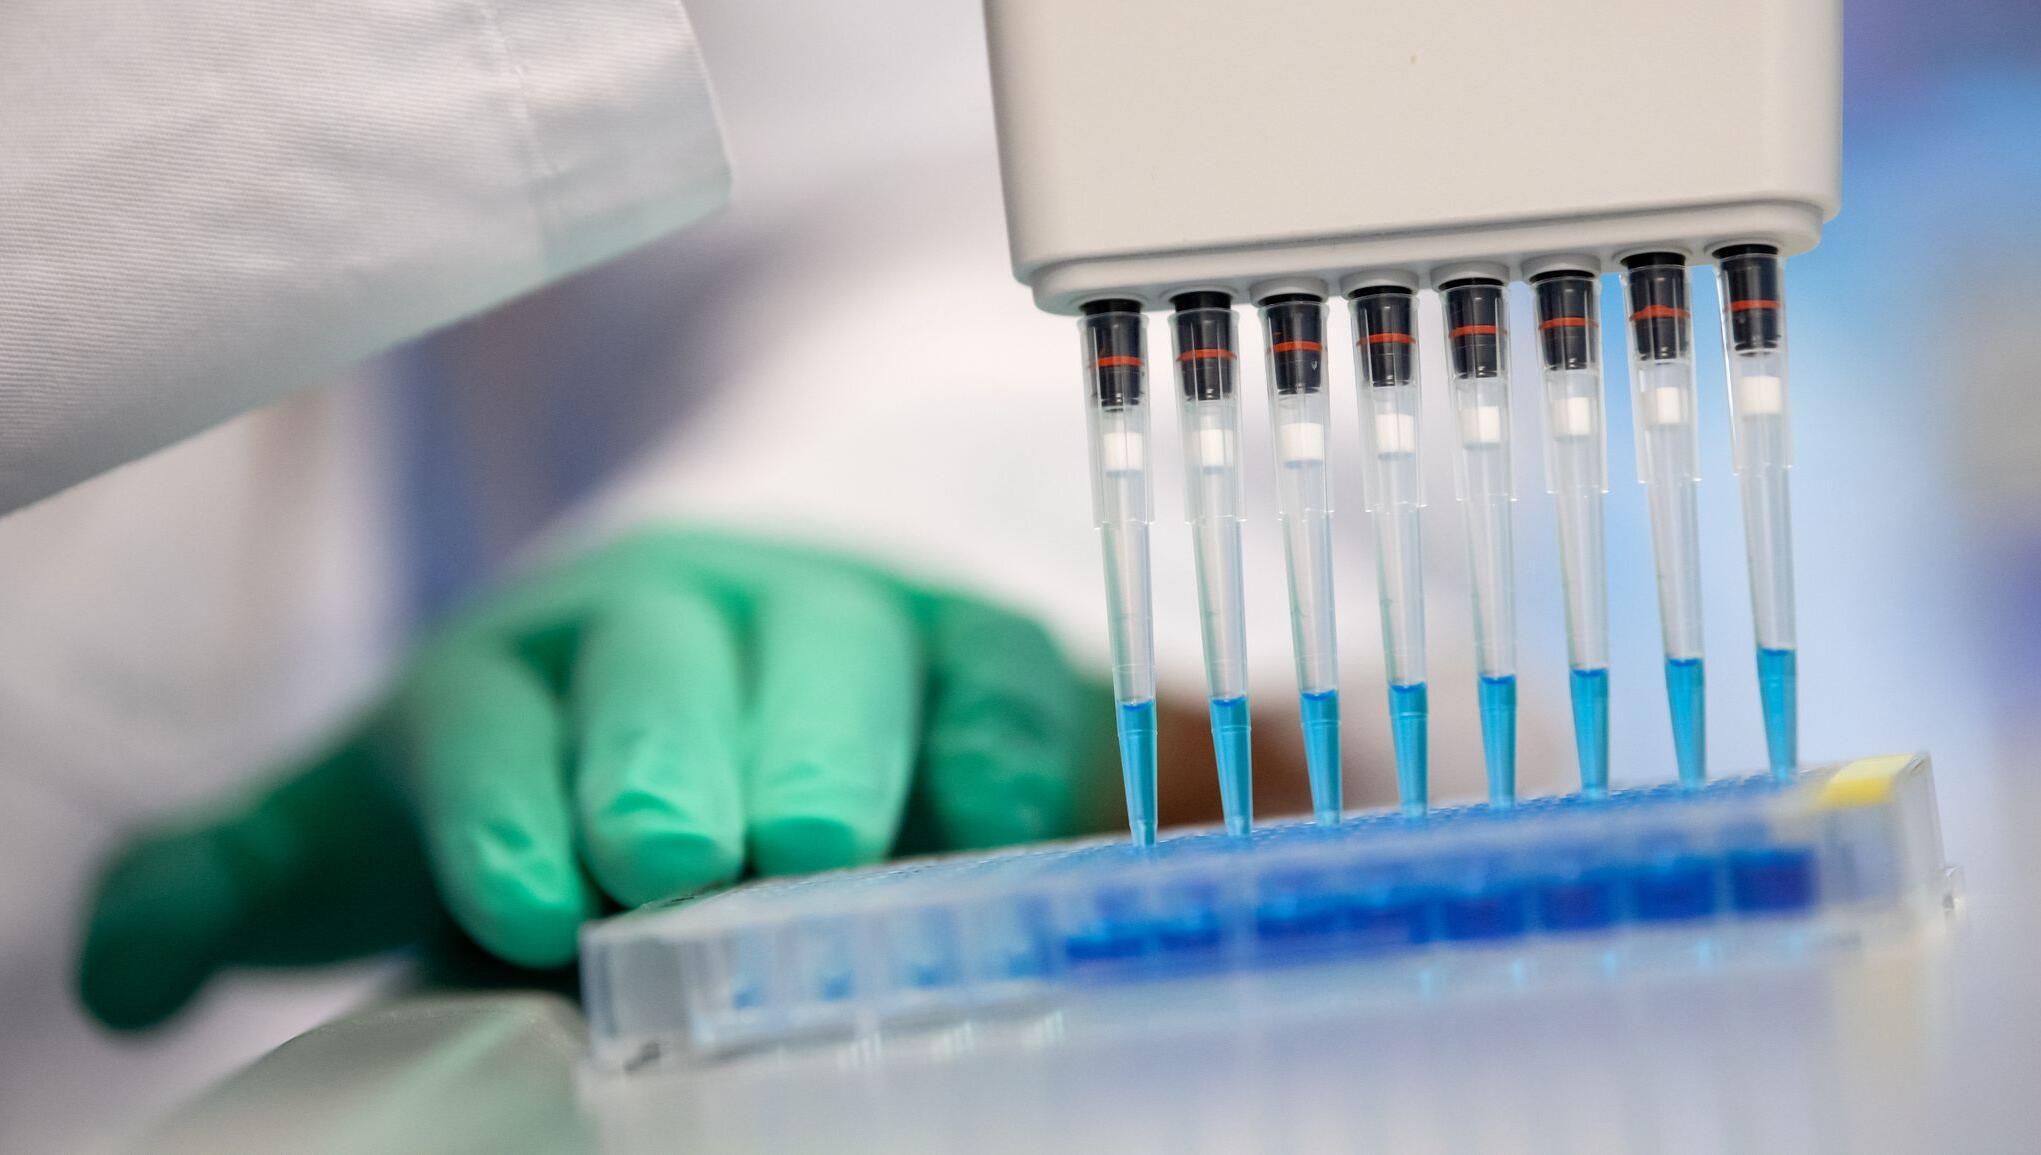 Bild zu Coronavirus - Corona-Bluttests in München